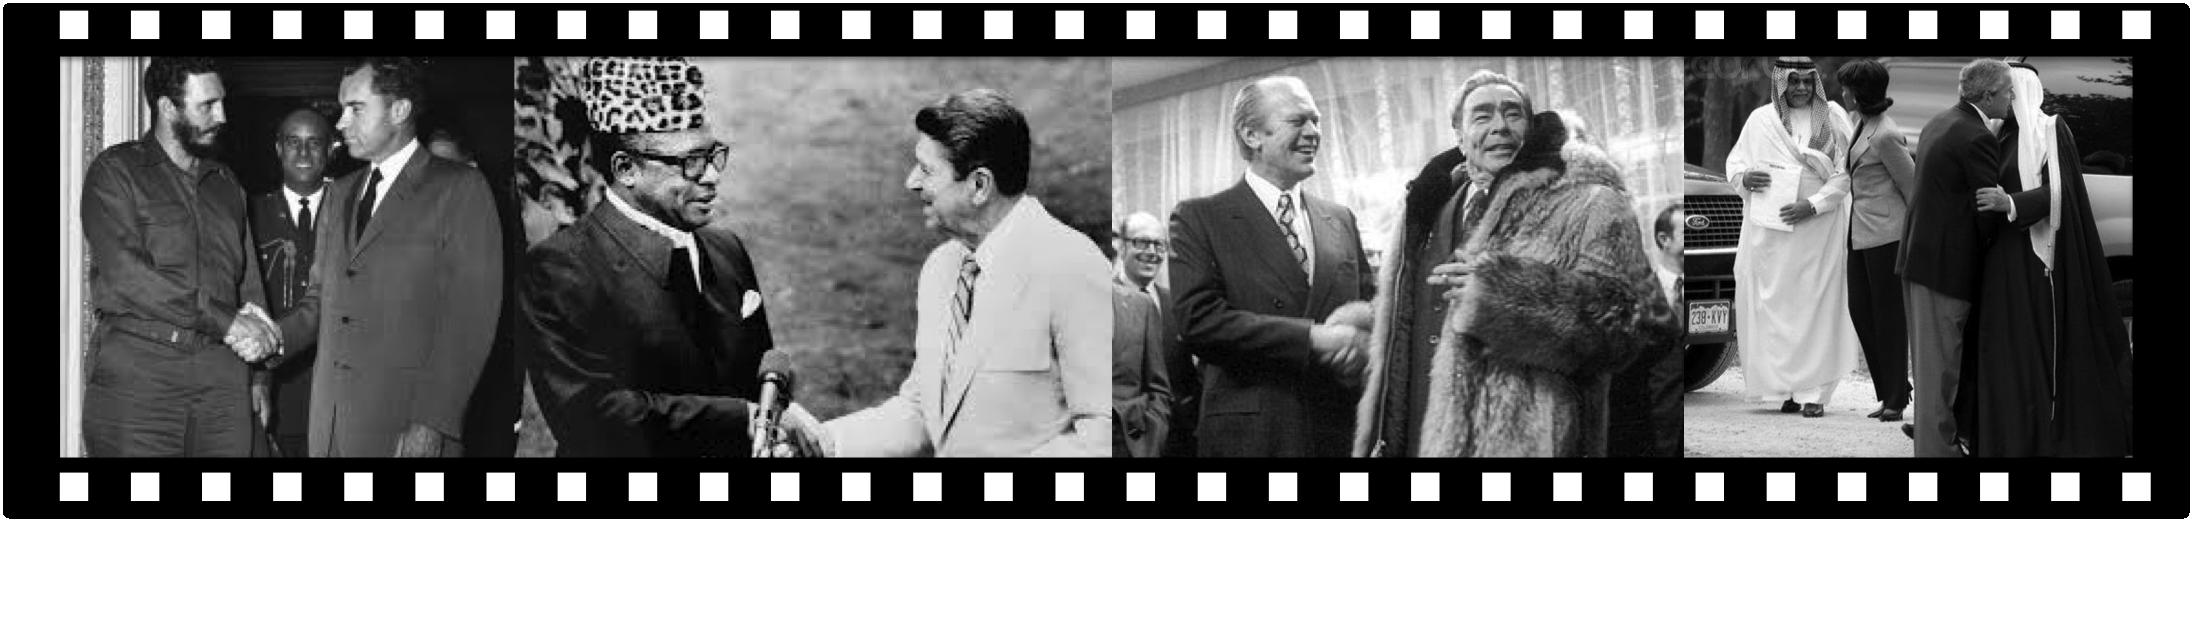 famous handshakes